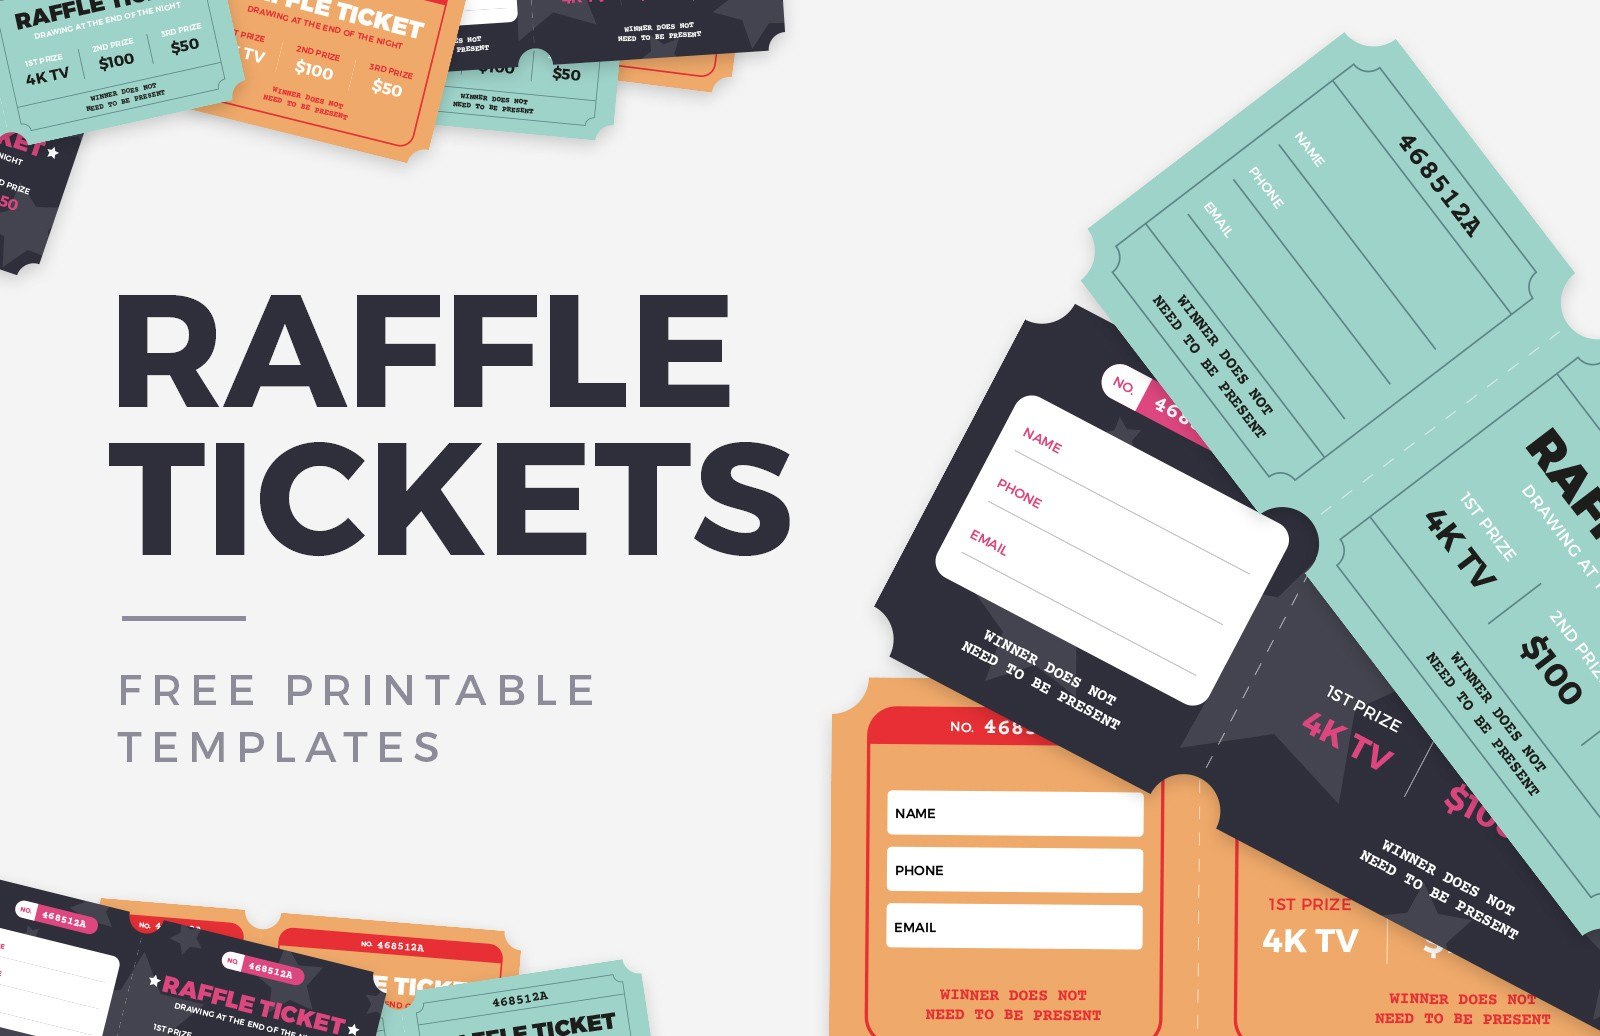 Free Raffle Ticket Templates